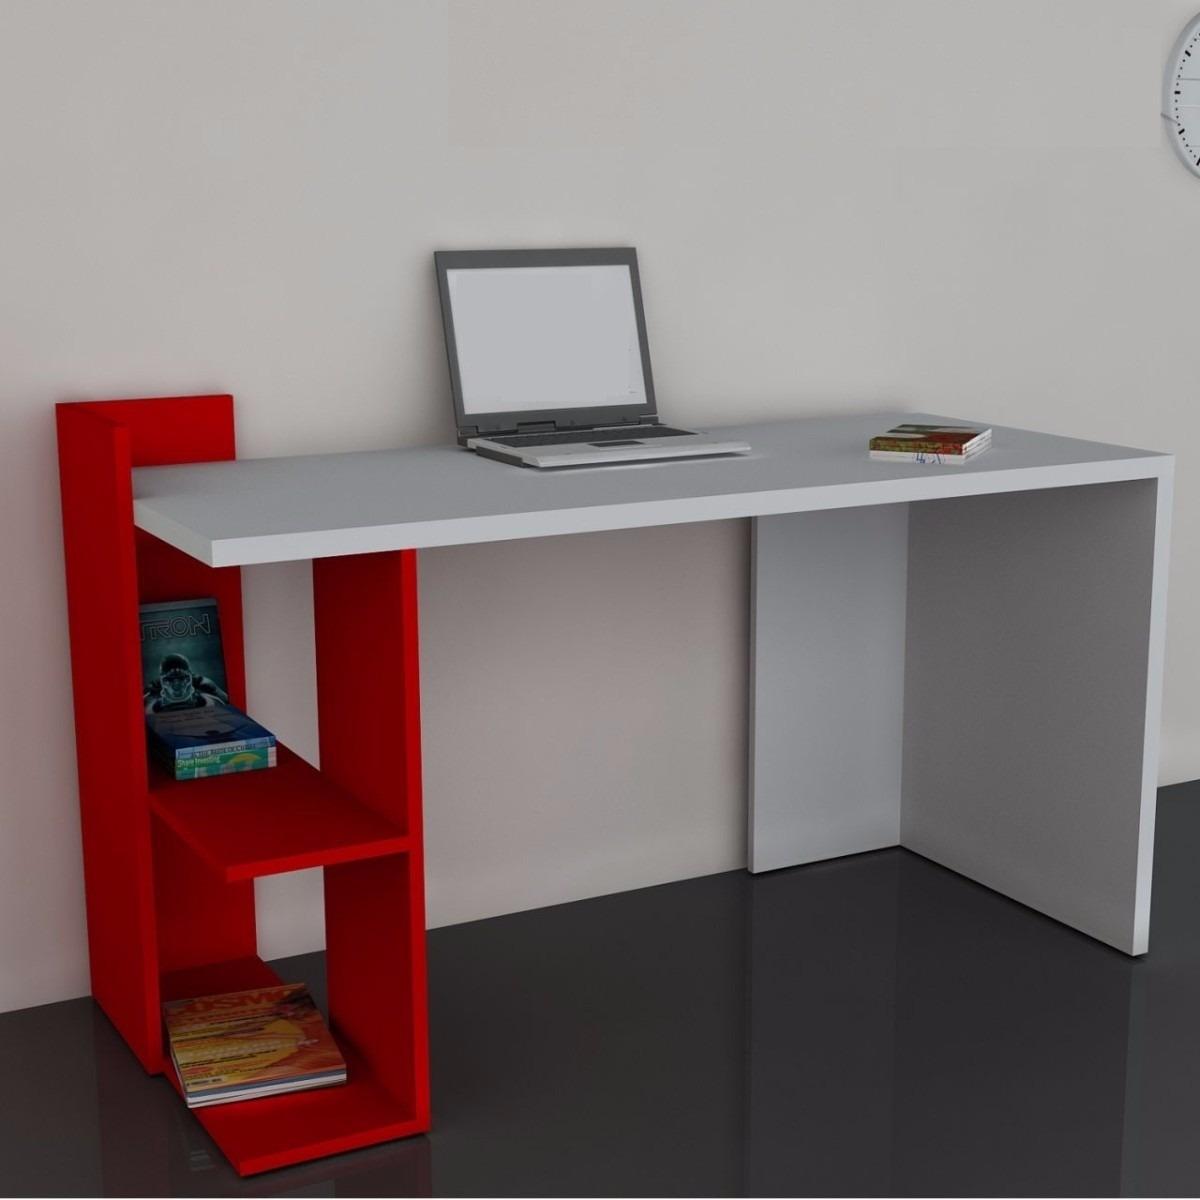 Escritorios modernos minimalistas de alta gama decoracion for Muebles de escritorio modernos para casa